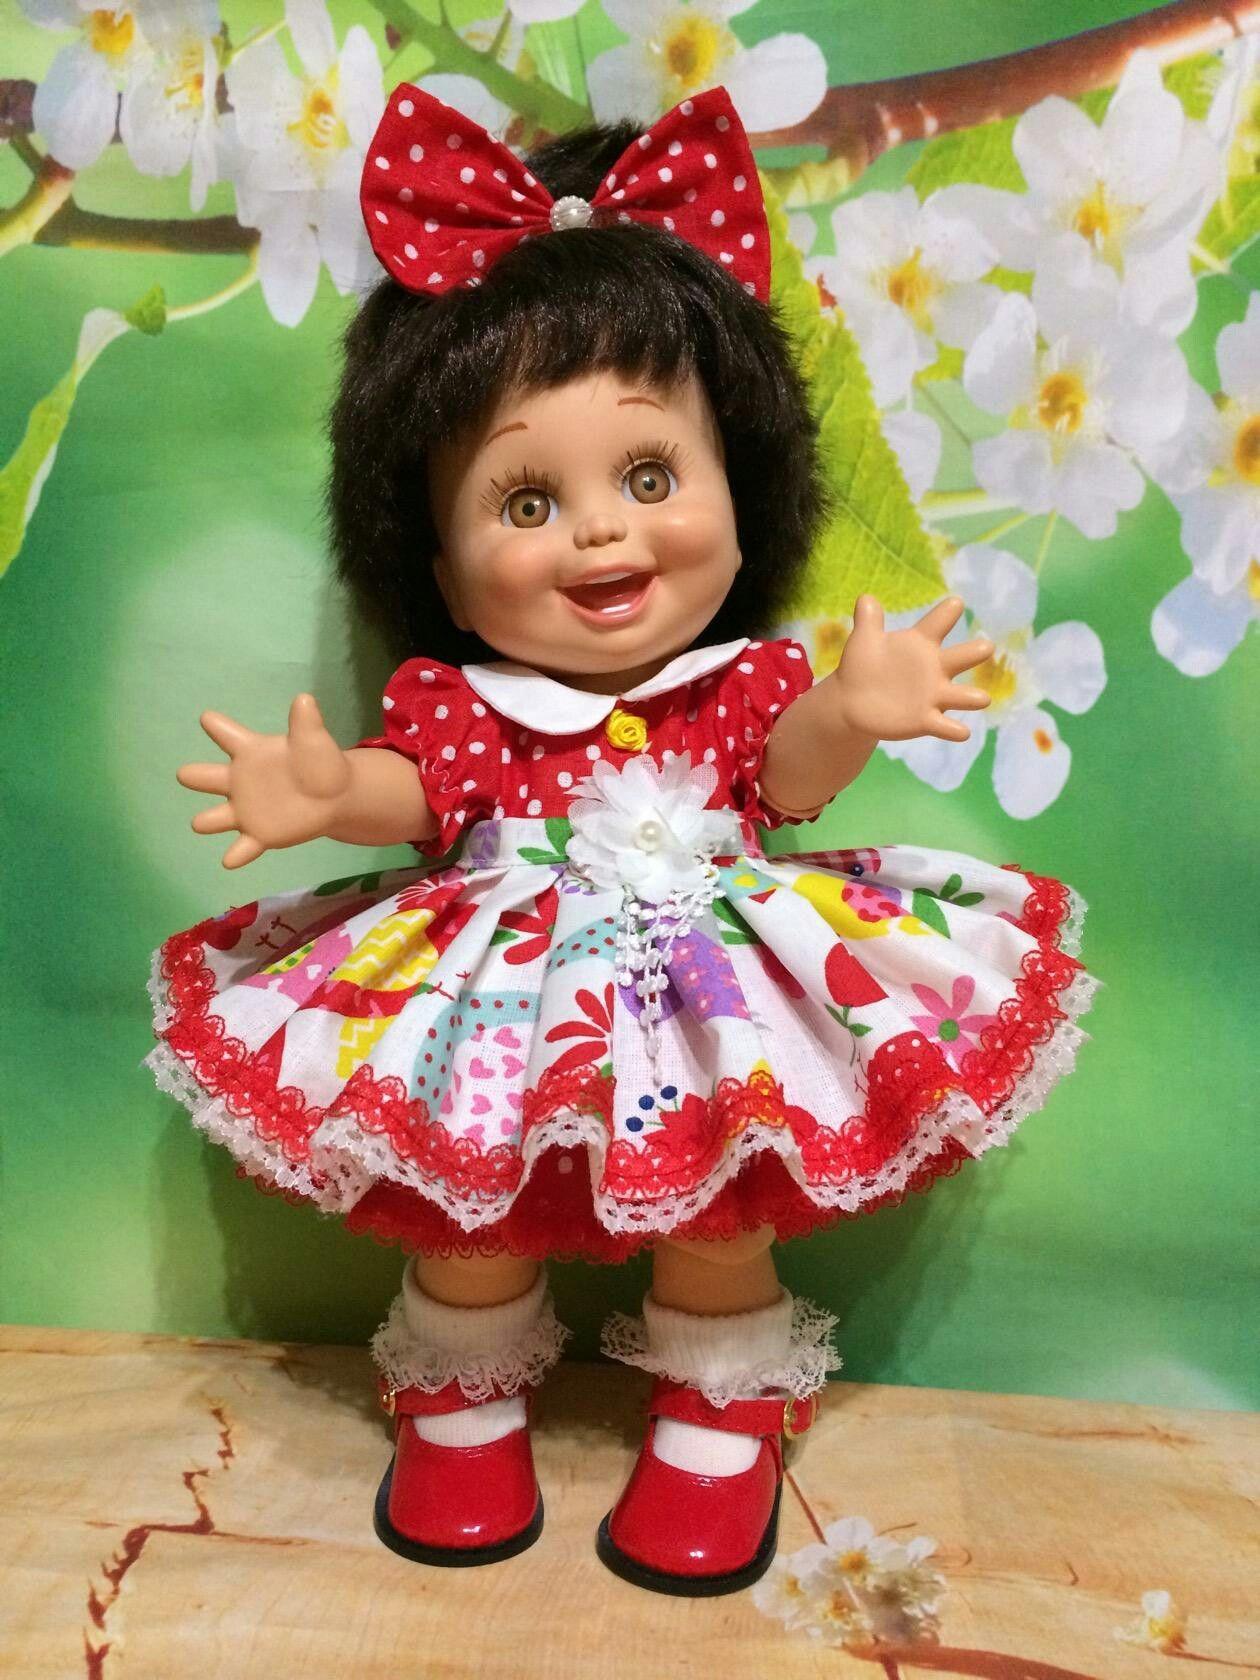 картинки смешные про кукол флешки